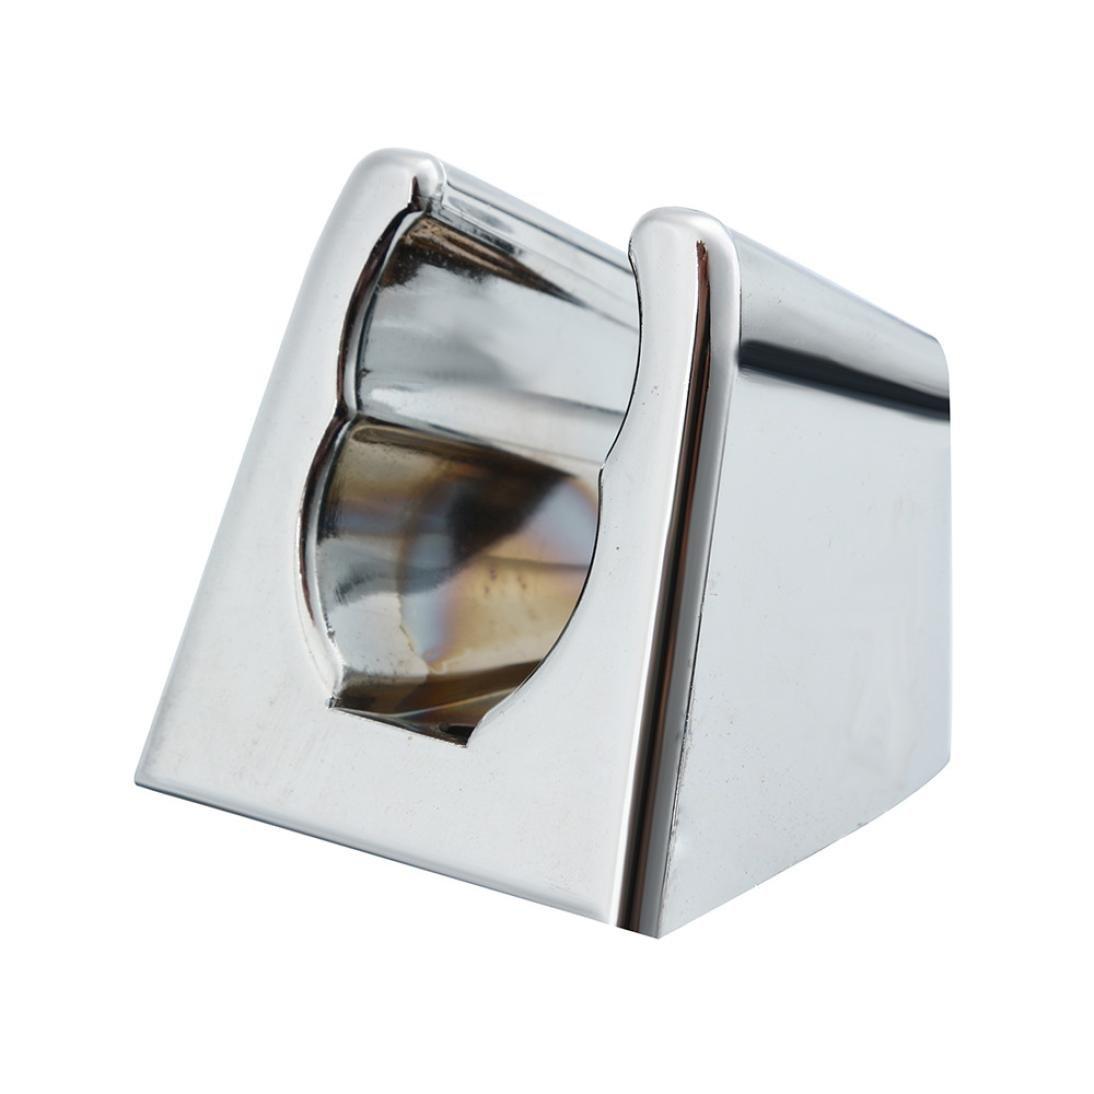 Nesix Universal Showering Components Shower-Head/Handheld-Shower Combo Douche Toilet Bidet Spray Wash Jet Shattaf Diverter (A, Sliver)